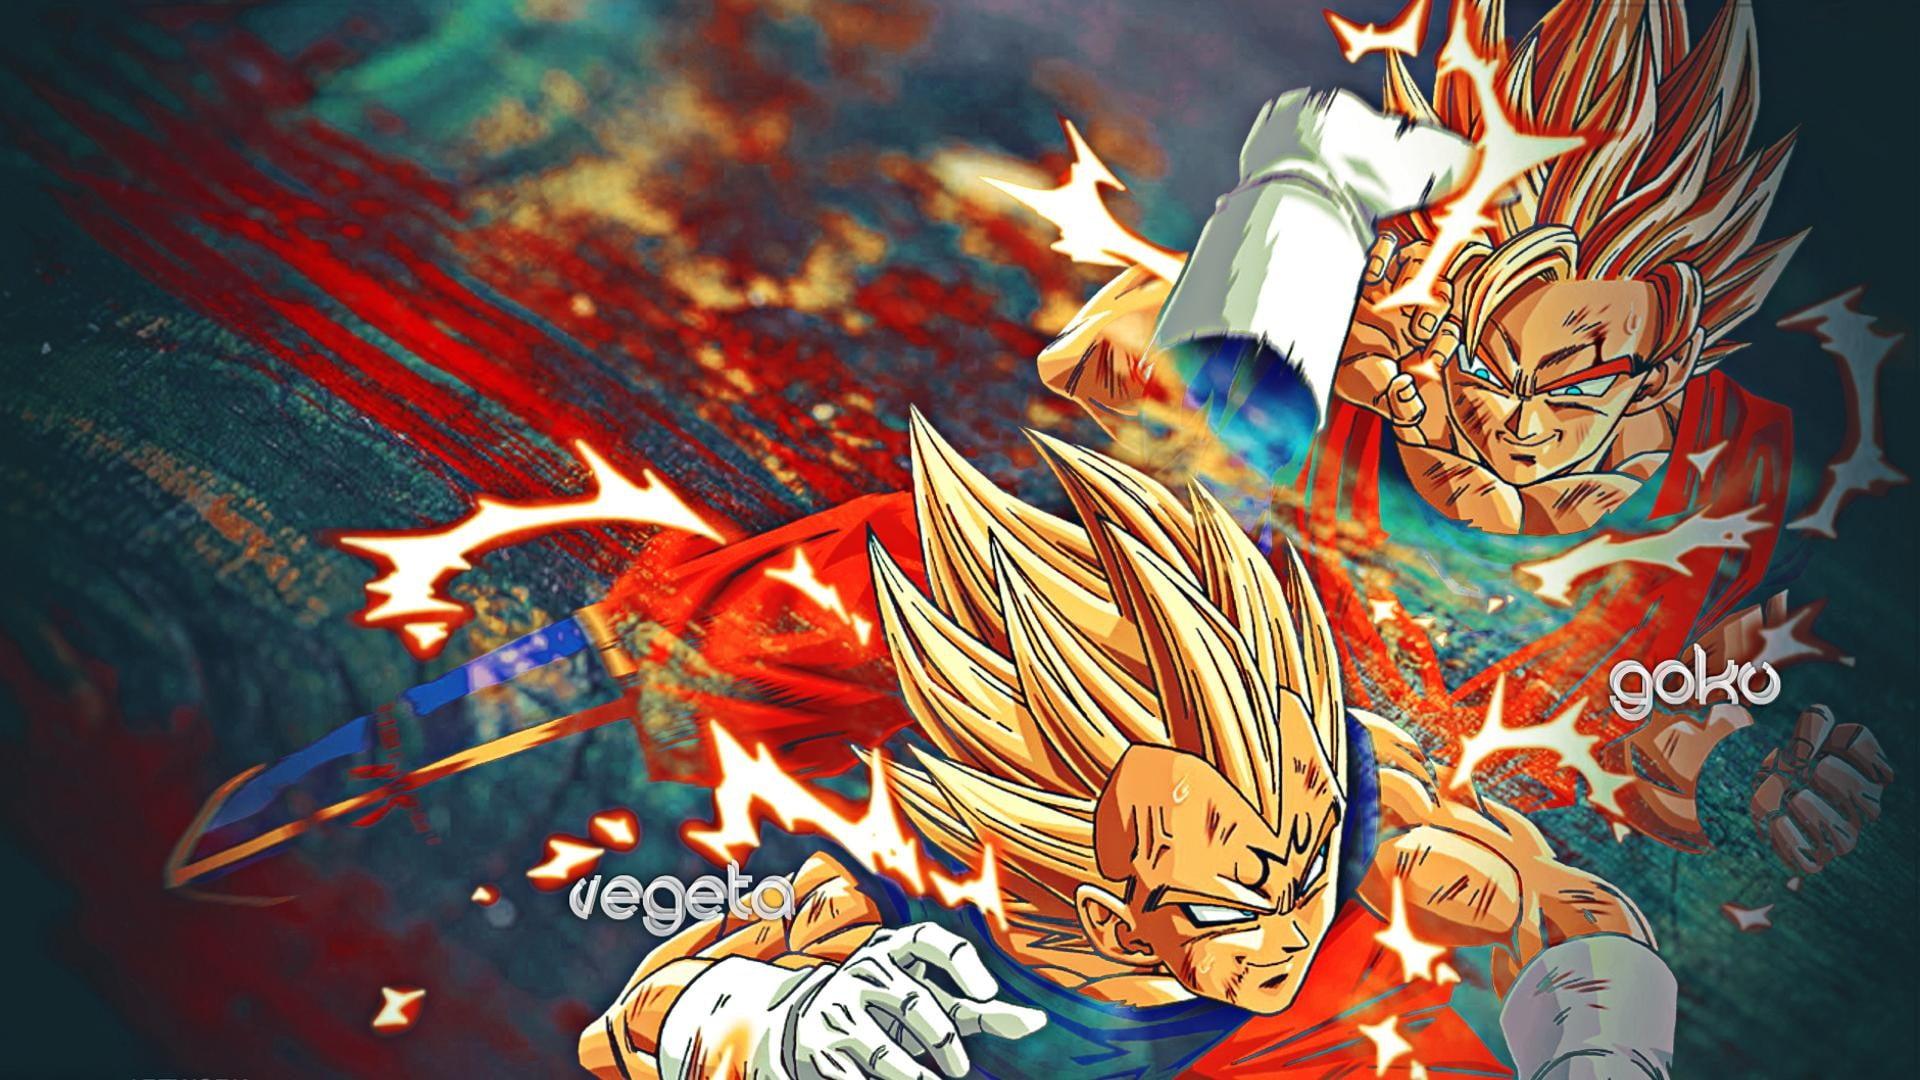 Son Goku And Vegeta Illustration Hd Wallpaper Dragonball Z Wallpaper Hd 1058721 Hd Wallpaper Backgrounds Download